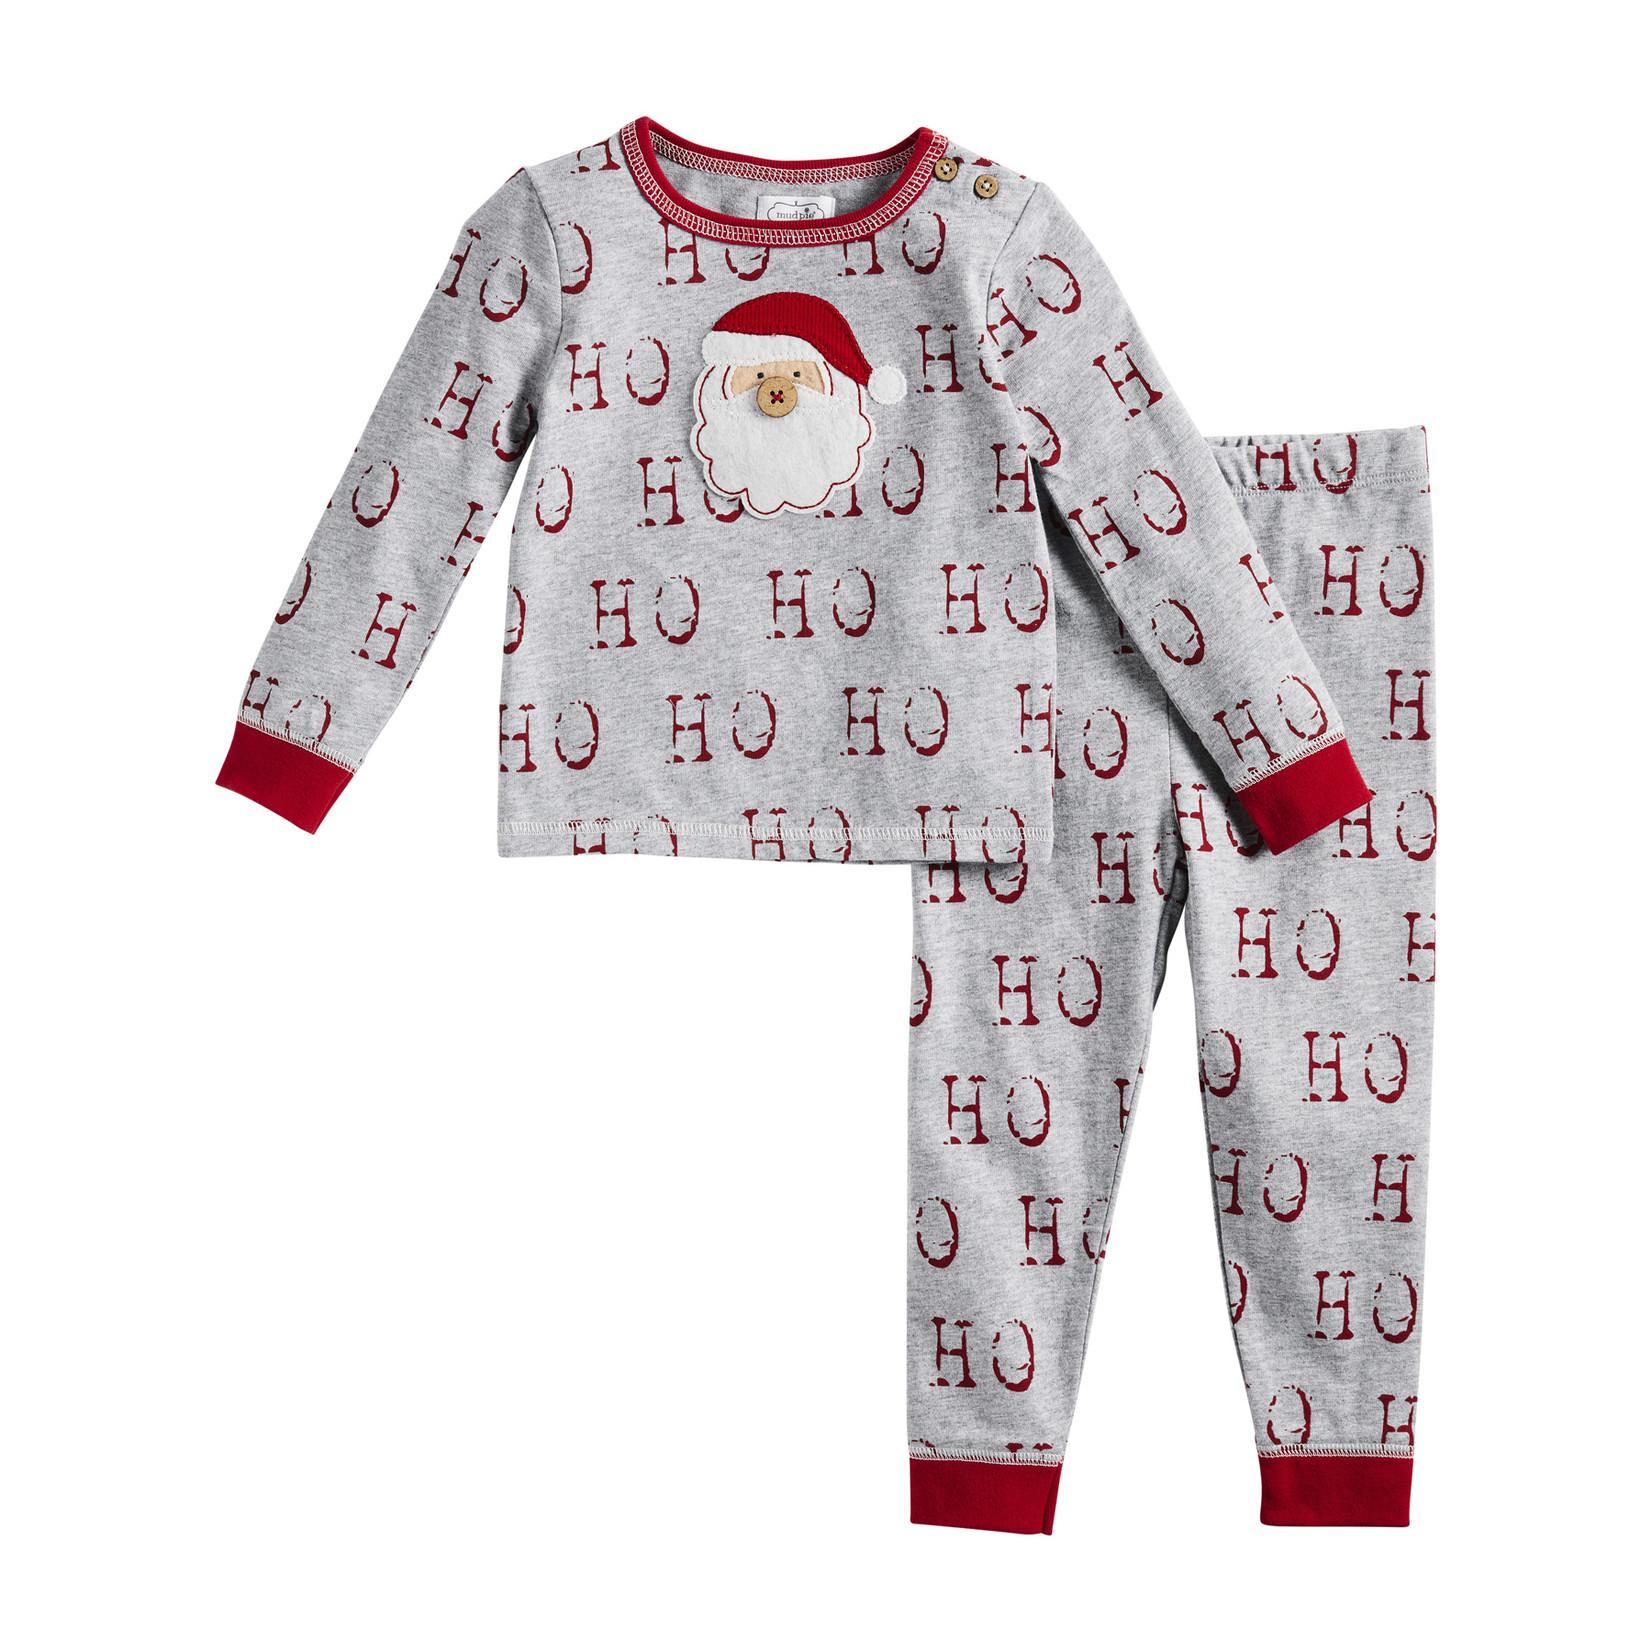 Mudpie Ho Ho Ho Unisex Pajamas